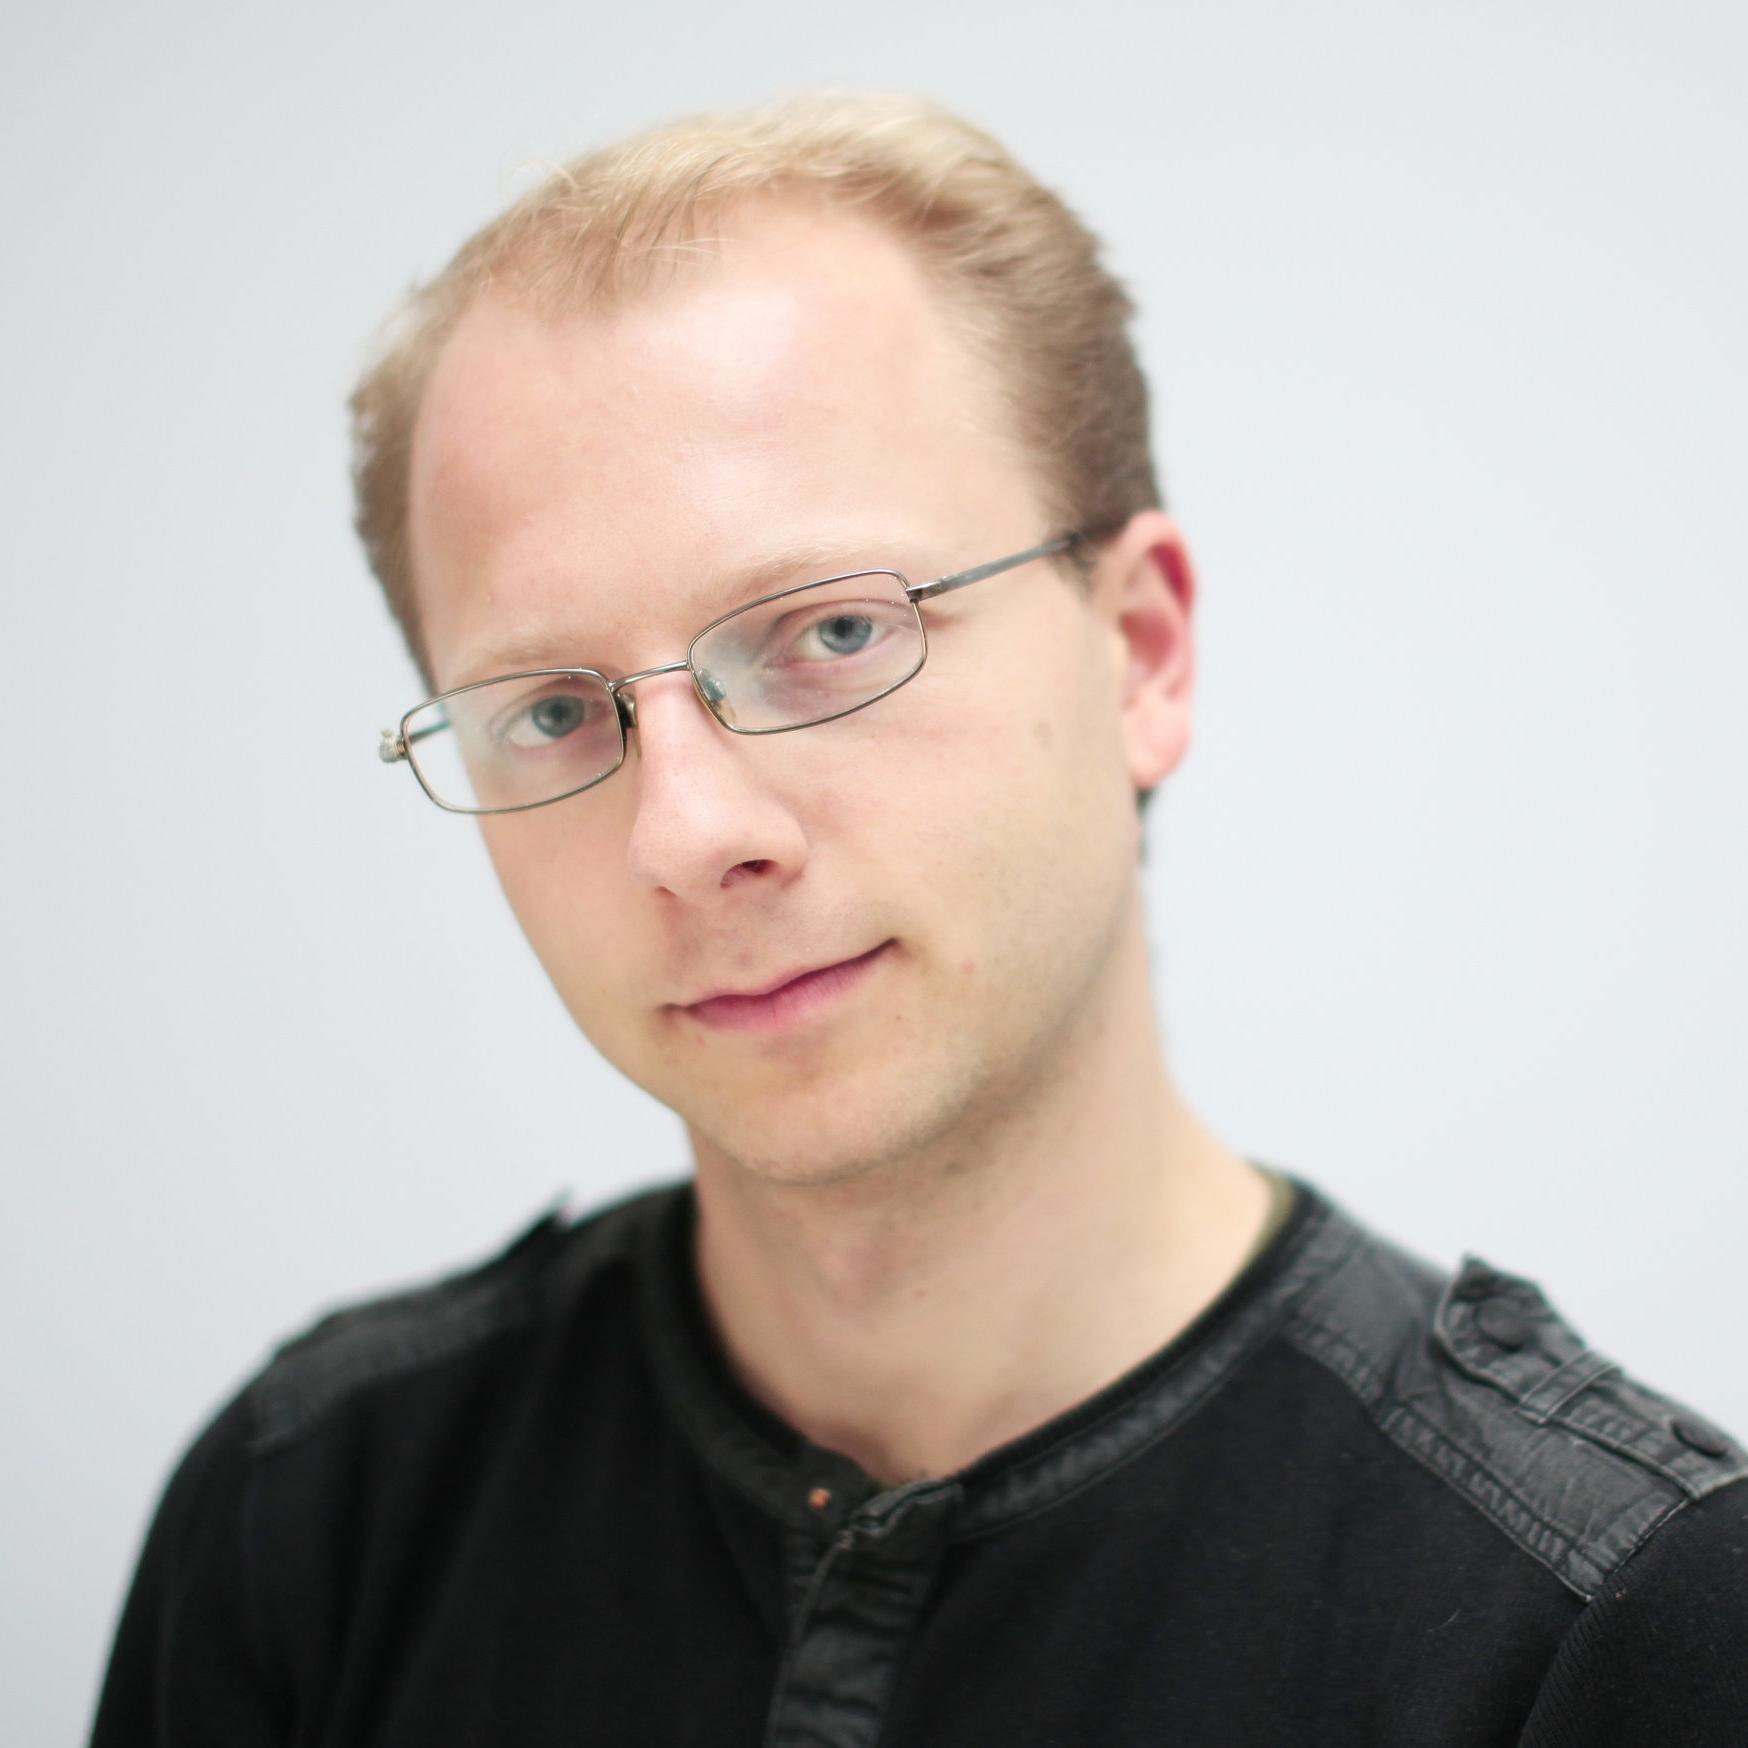 Bjørn Samset, klimaforsker ved CICERO:  Var hetebølgen i sommer vær eller bevis på at klimaendringene har nådd Norge?